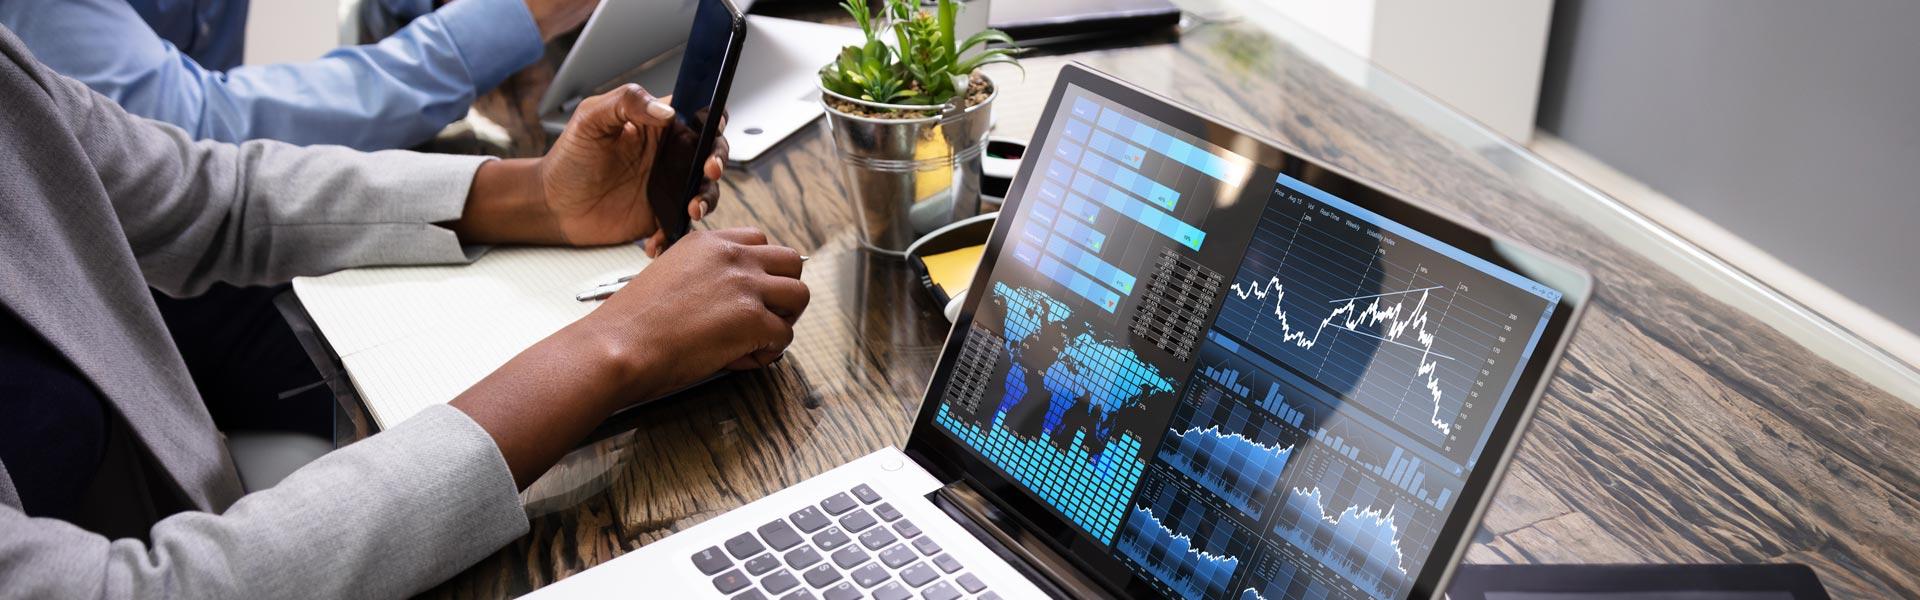 visual-strategic-guide-embedded-vs-enterprise-analytics